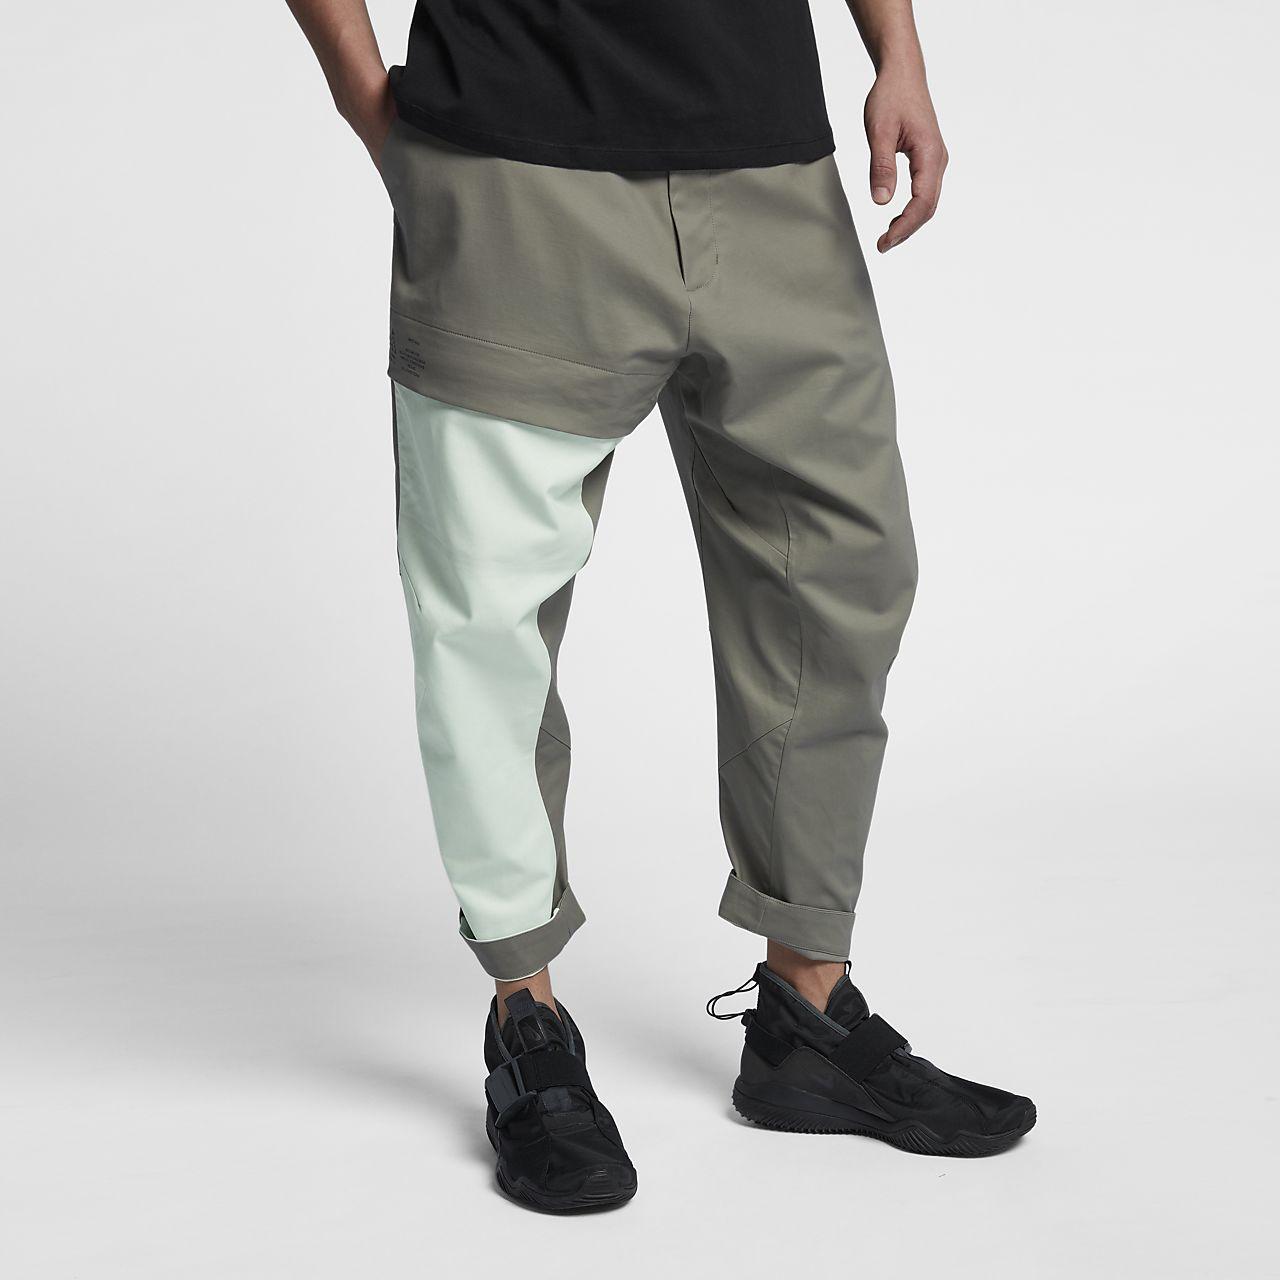 Nikelab Acg Men Trousers Nike